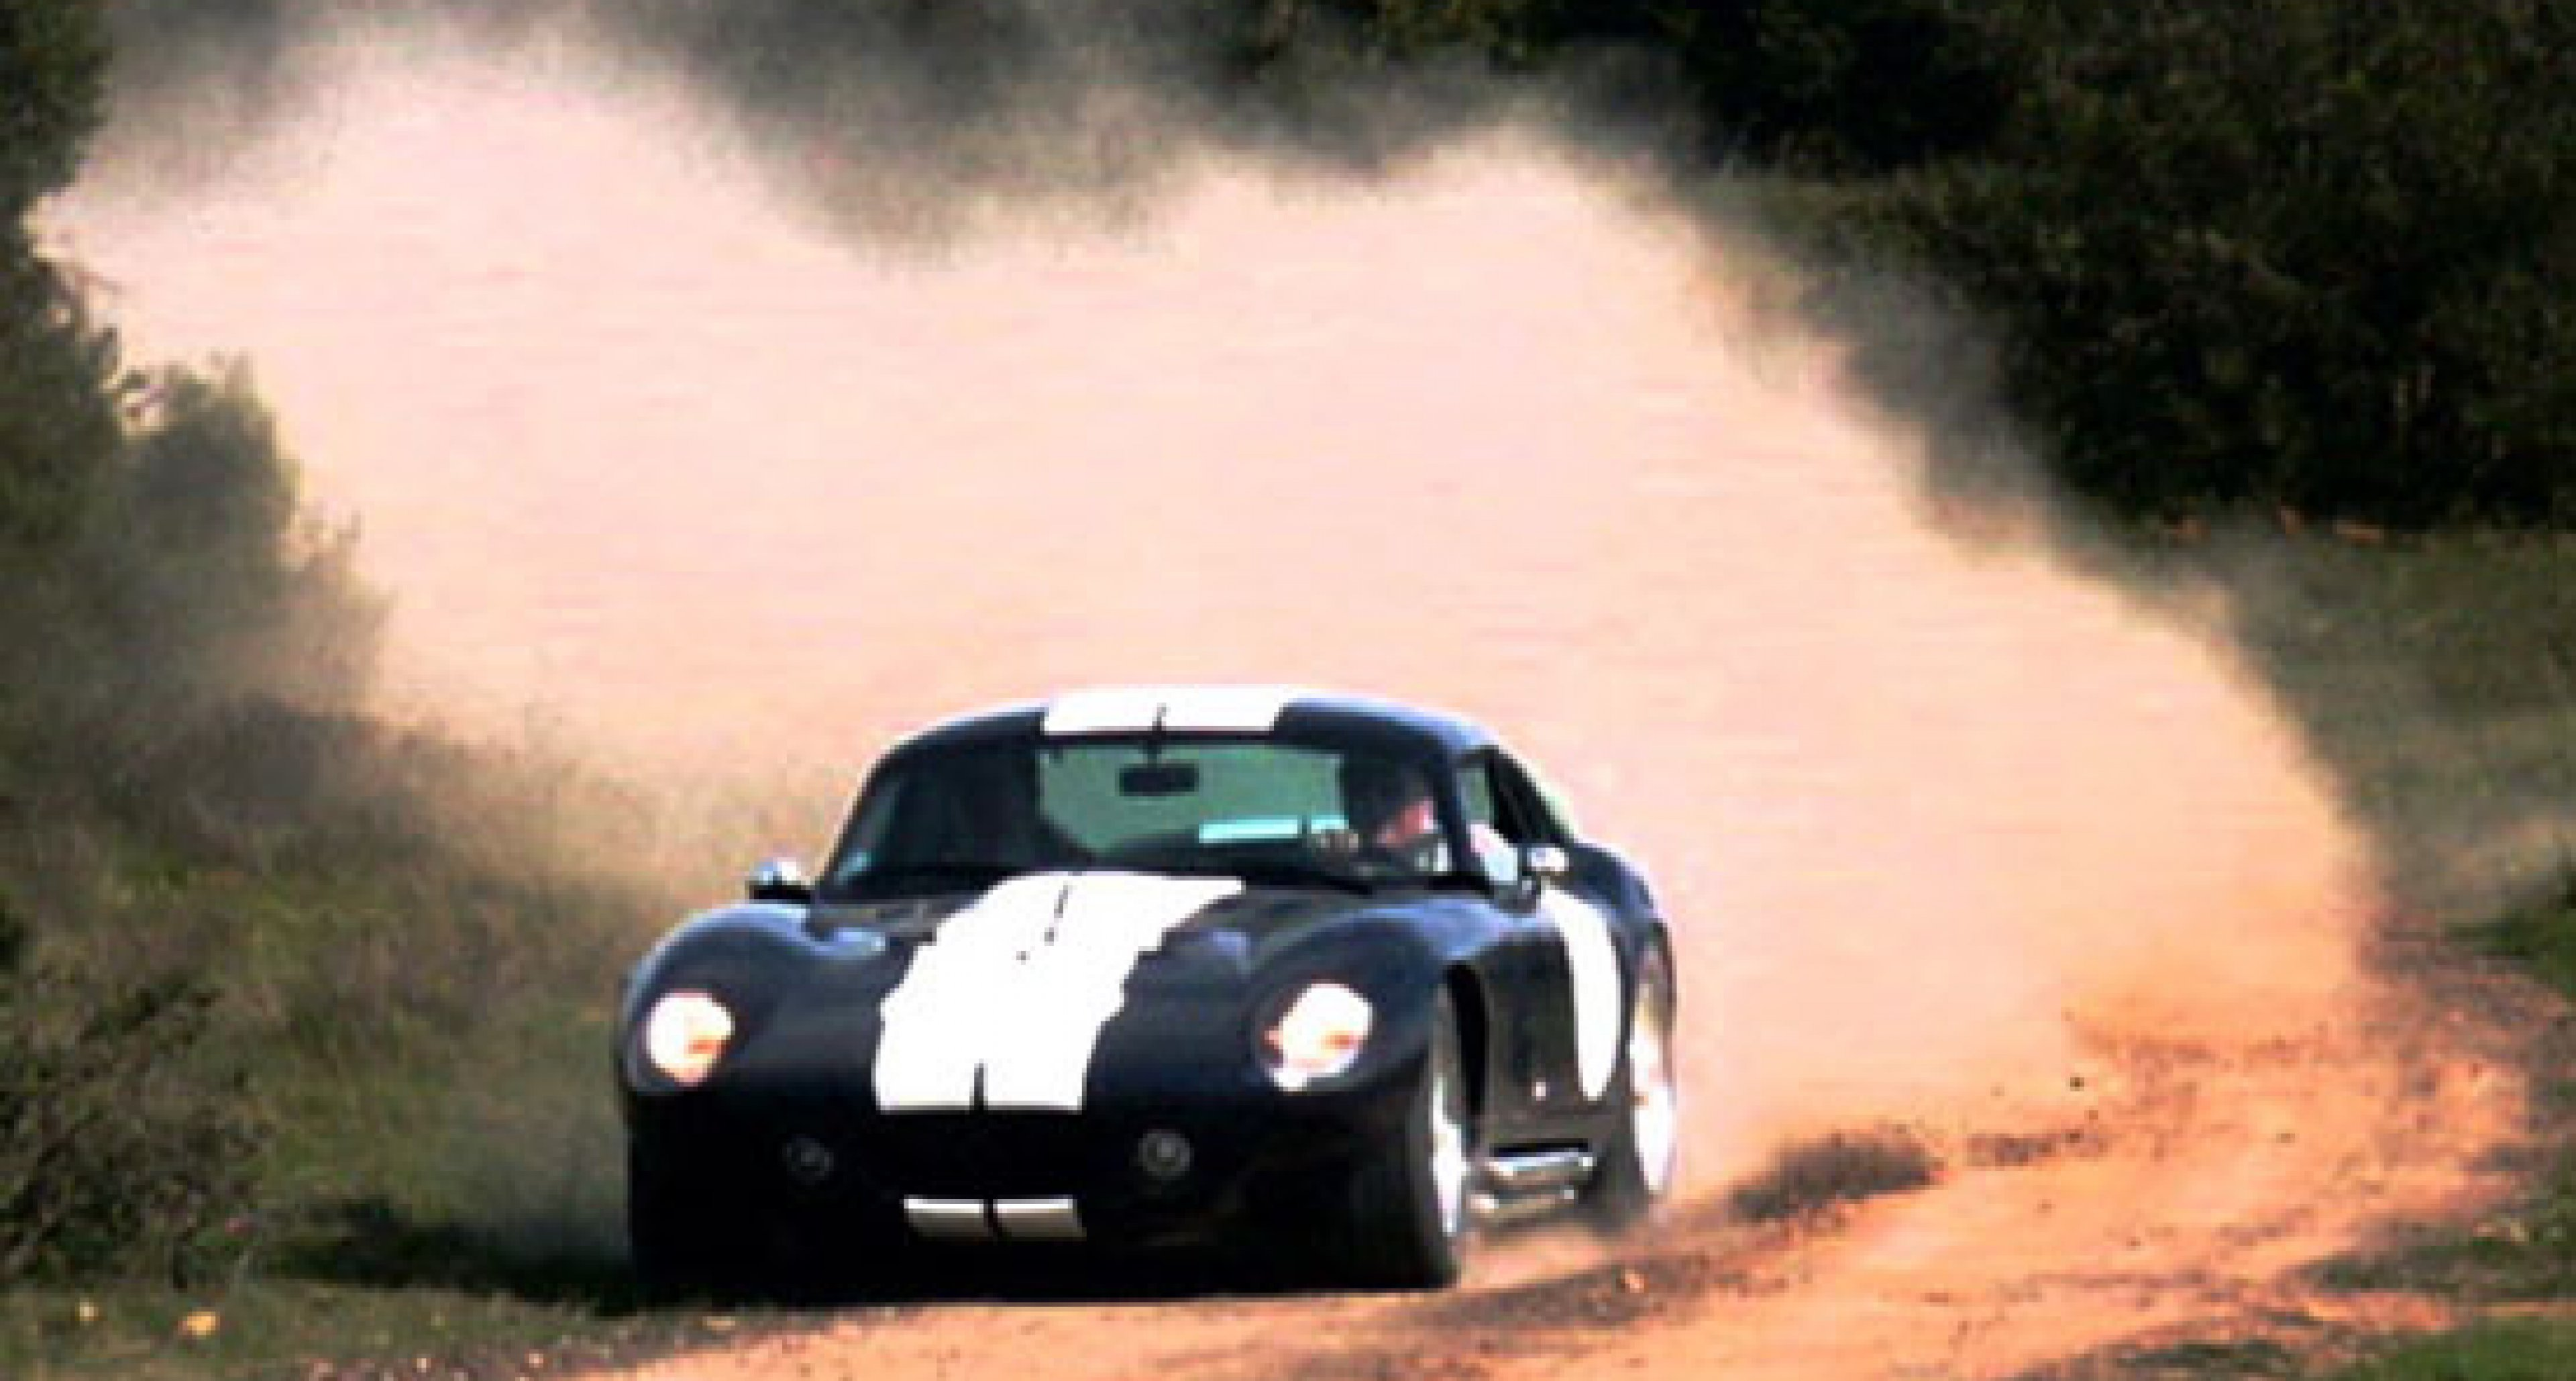 2004 Superformance Le Mans Coupés for UK debut at NEC Classic Show this November